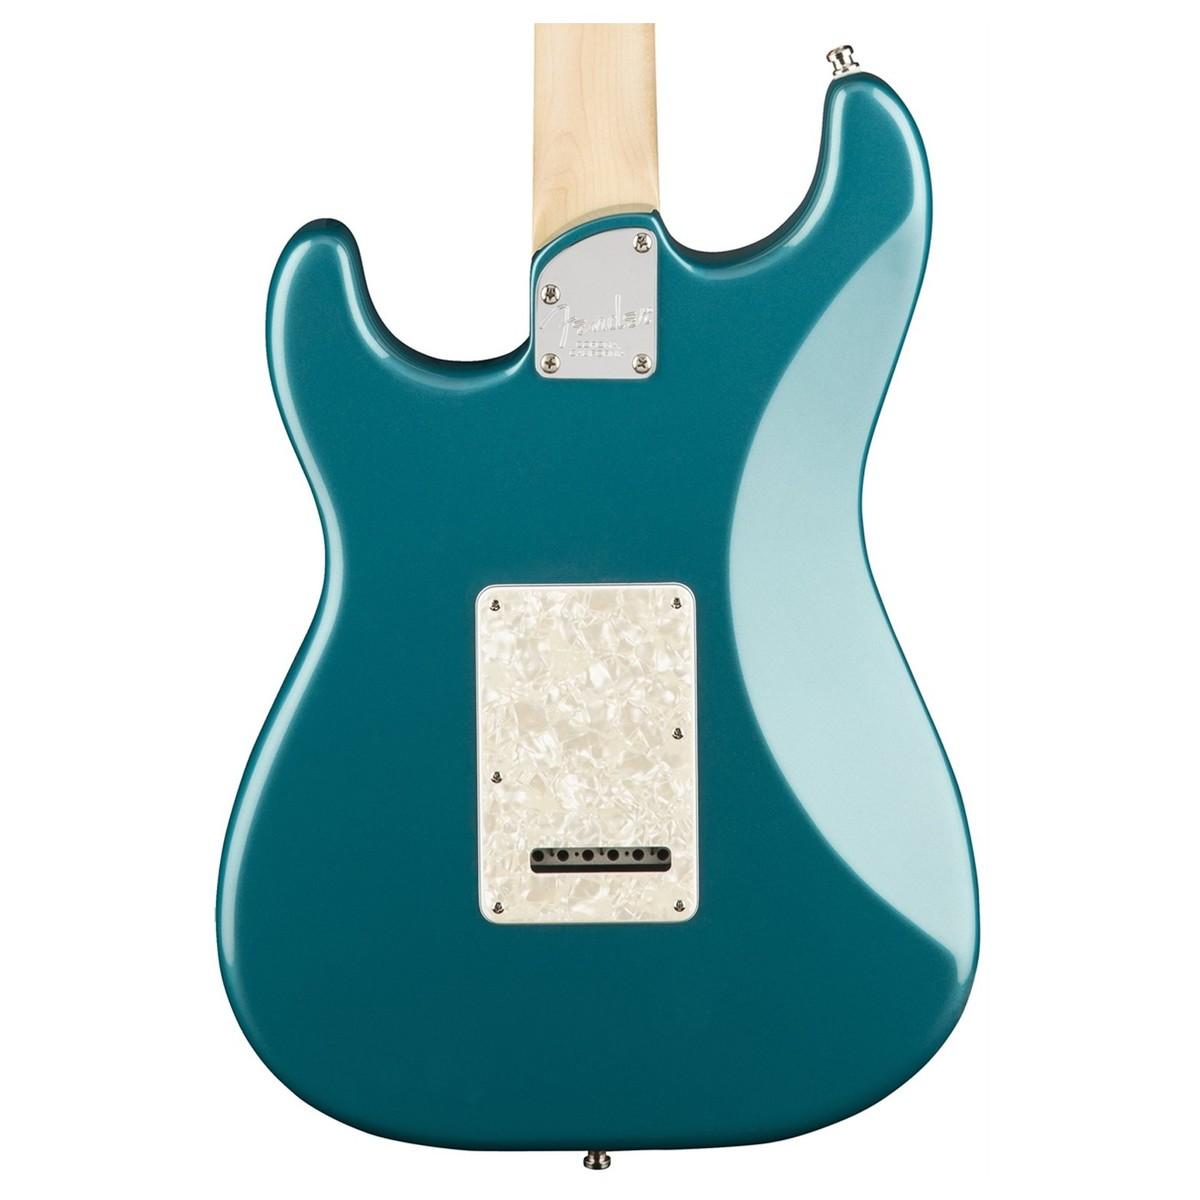 Fender American Elite Strat HSS EB, Ocean Turquoise at Gear4music.com